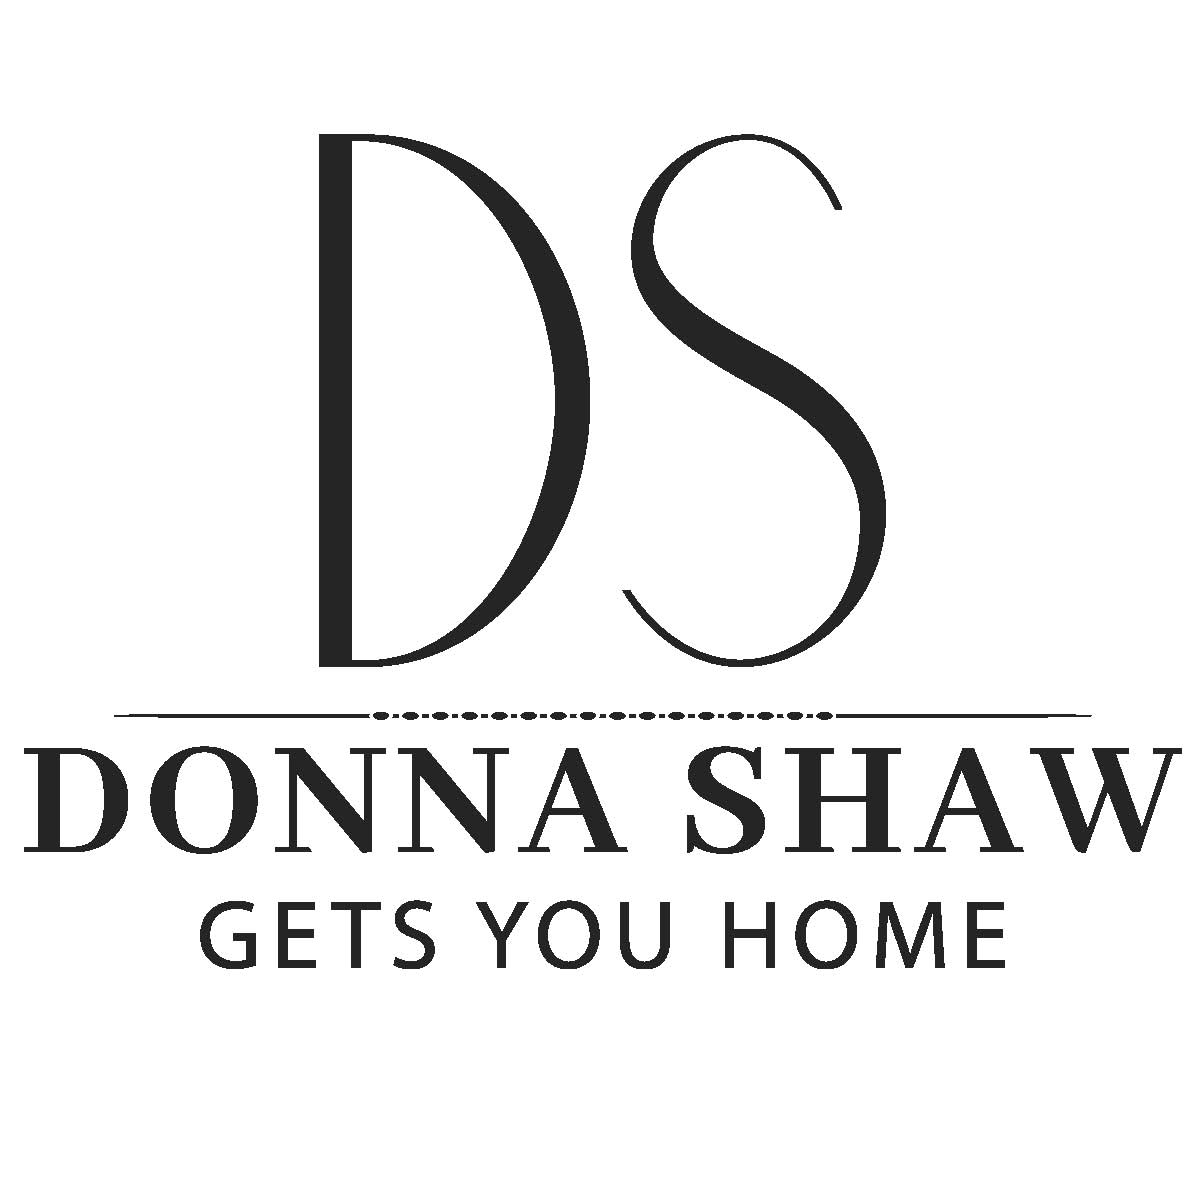 Donna Shaw Realtor